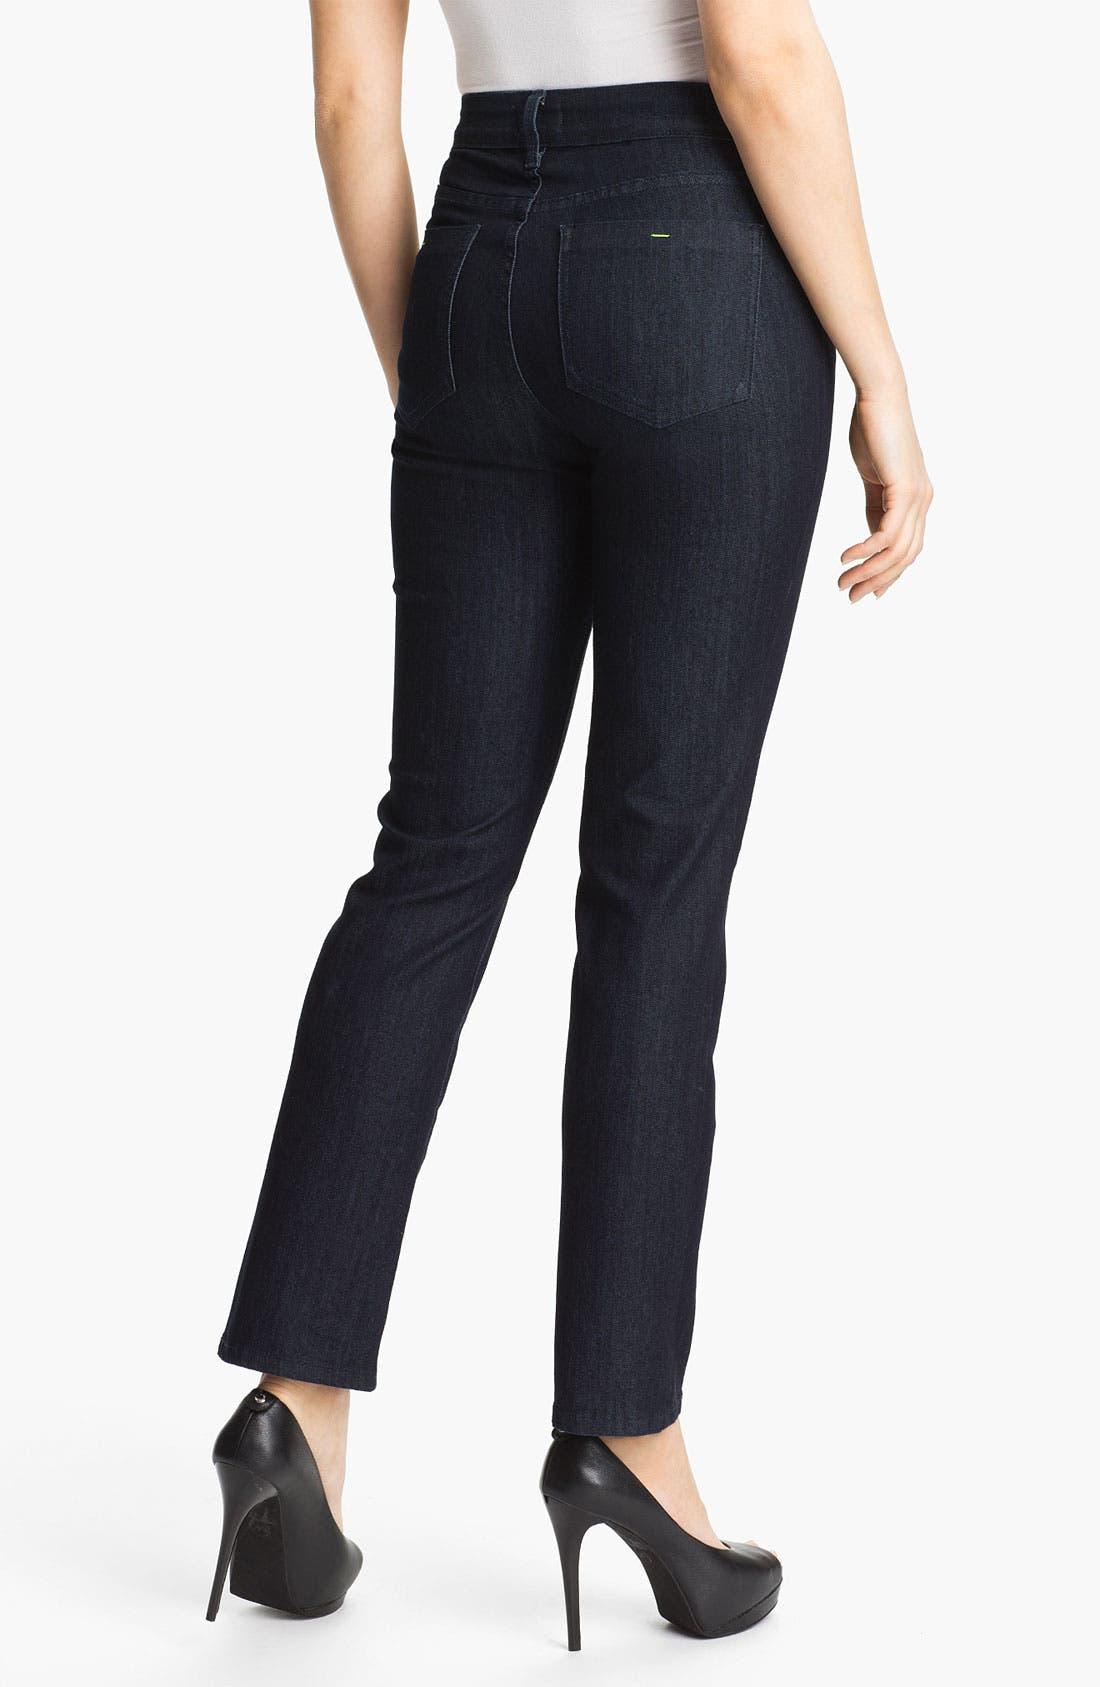 Alternate Image 2  - NYDJ 'Sheri' Neon Stitch Skinny Stretch Jeans